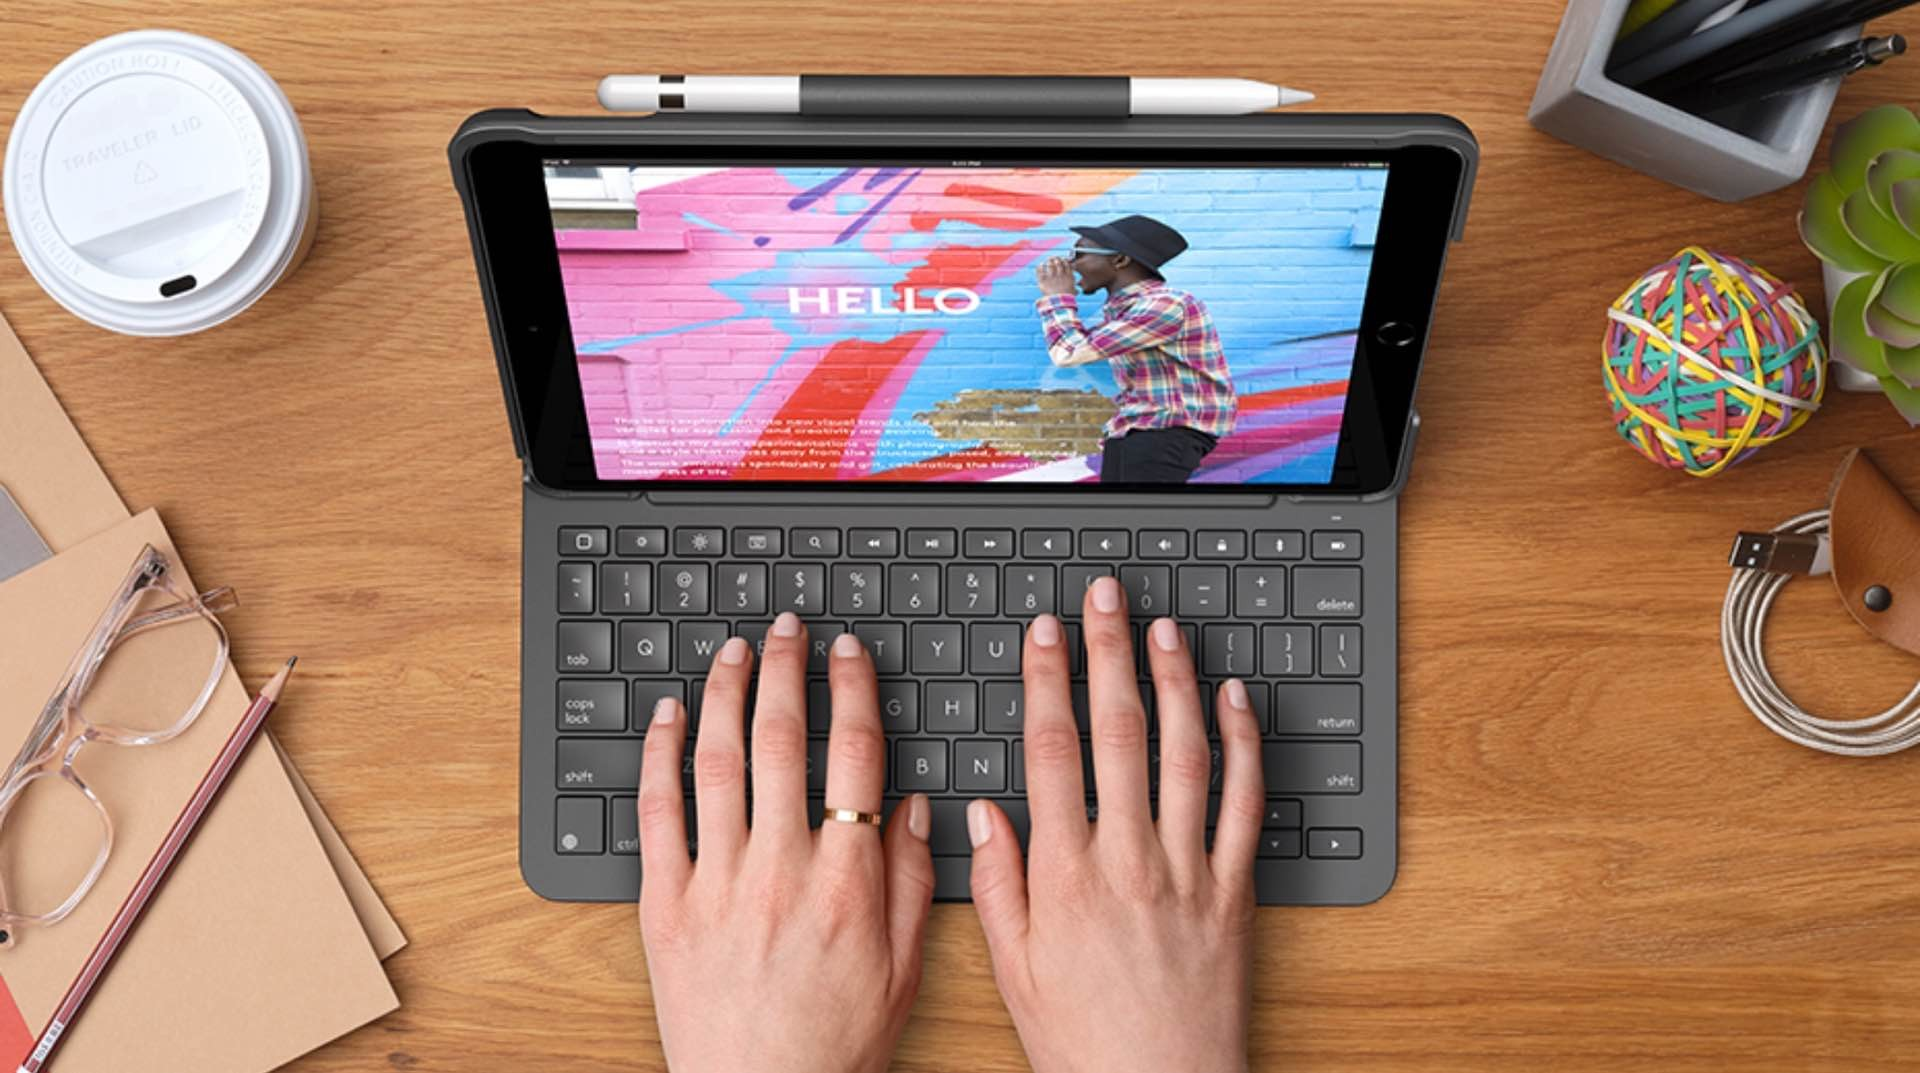 logitech-slim-folio-keyboard-case-for-8th-gen-ipad-2020-typing